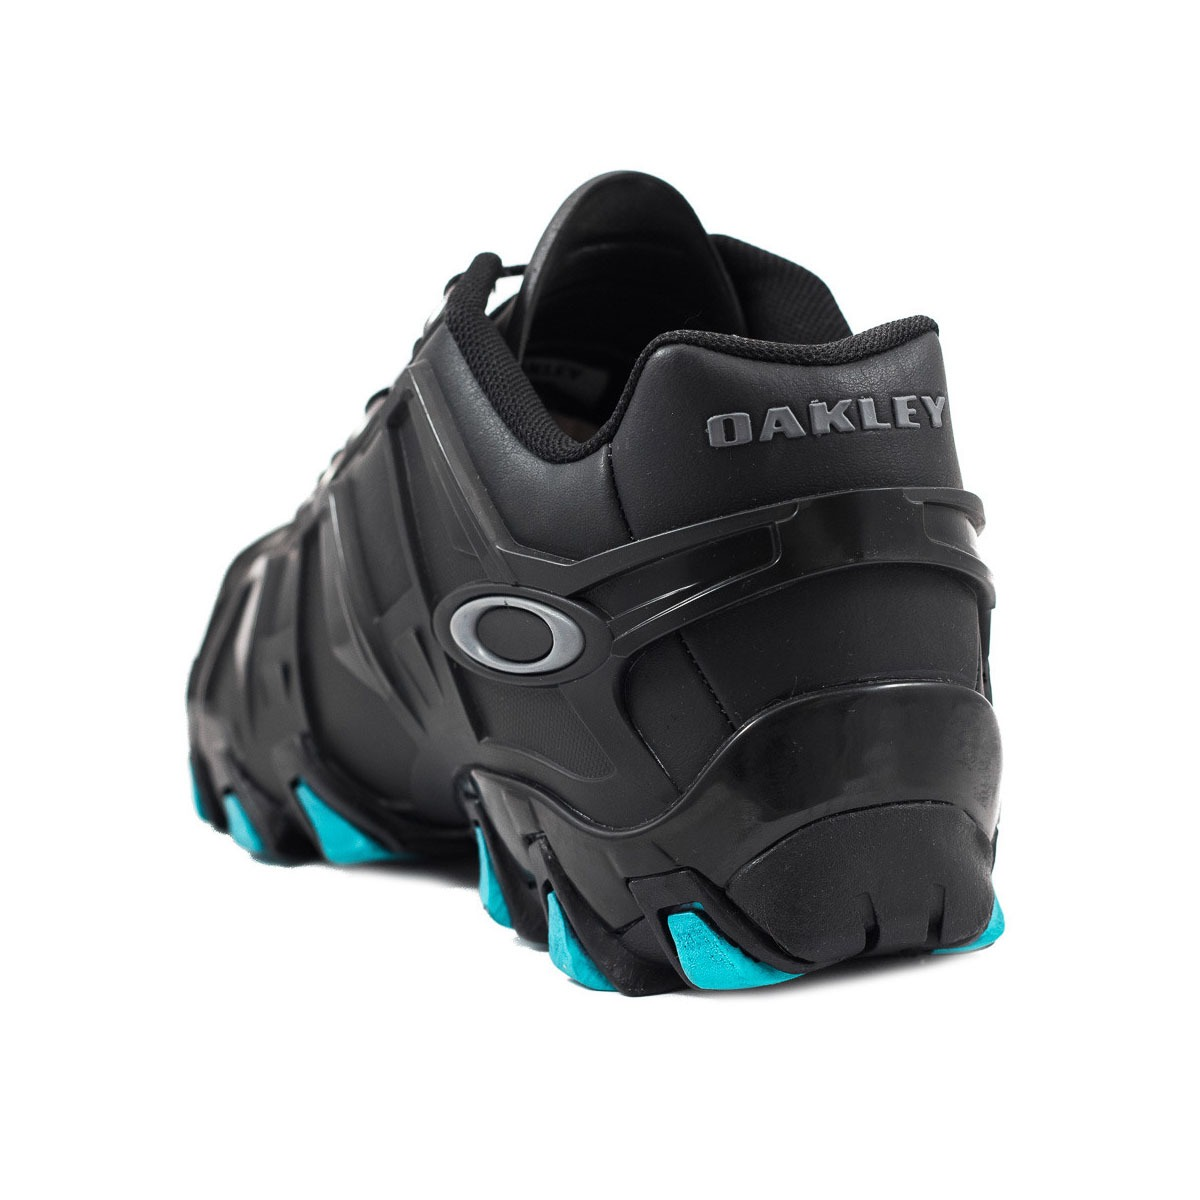 49f3ebbb45dd2 tênis oakley hardshell 3 em couro black turquoise. Carregando zoom.